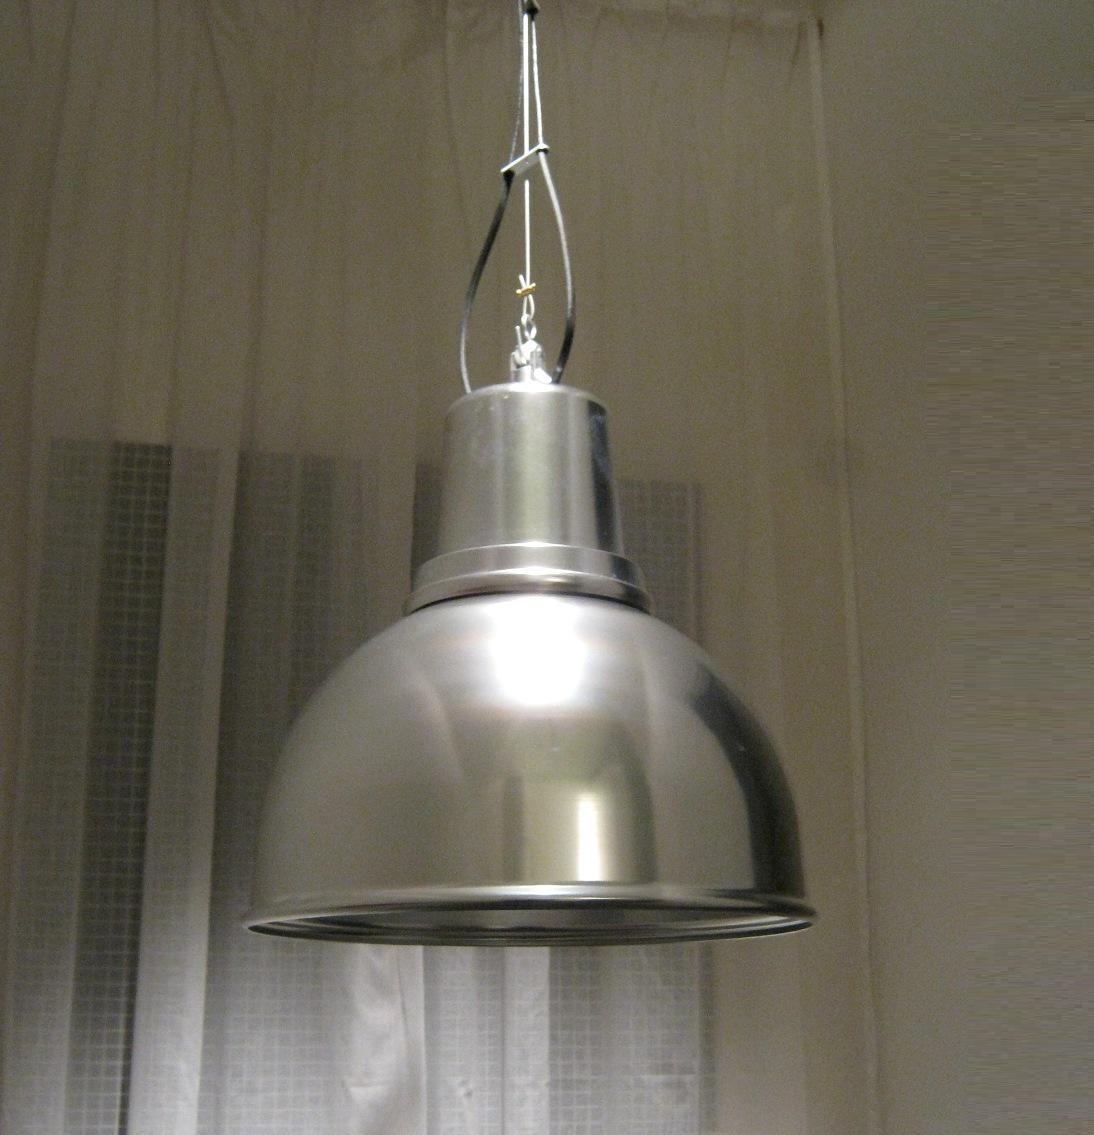 Boffi Illuminazione Lampade a sospensione naviglio boffi , boffi offerta - Illuminazione a ...